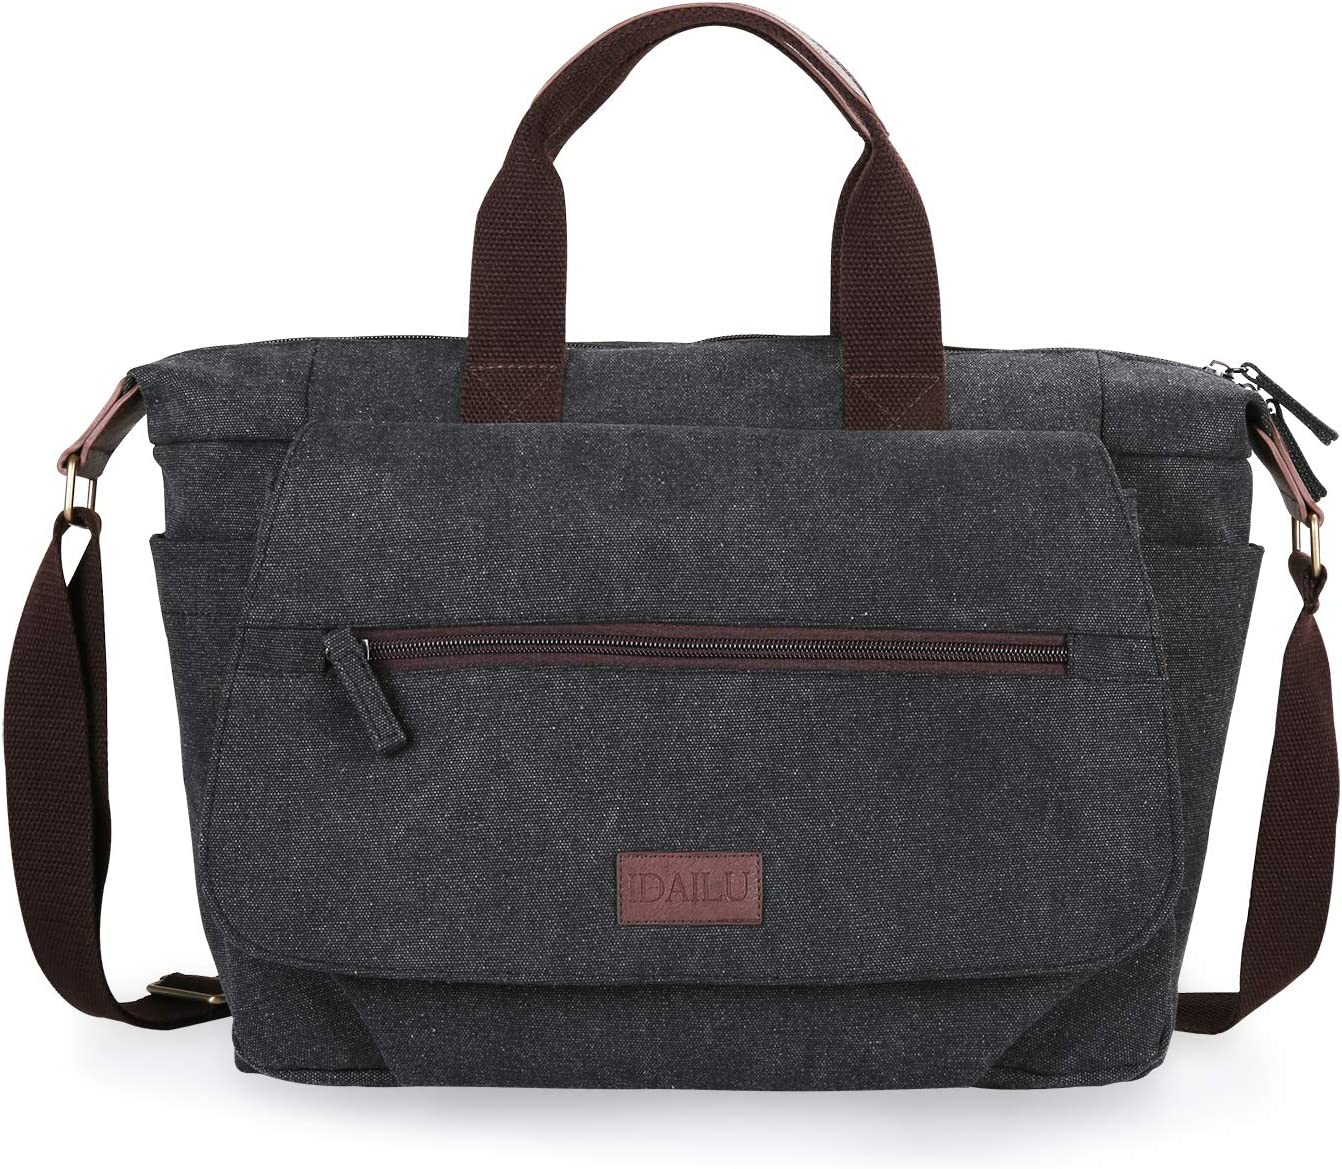 IDAILU Women Travel Weekend Bag Canvas Large Shoulder Totes Overnight Carry On Luggage Handbags (Black, Large)